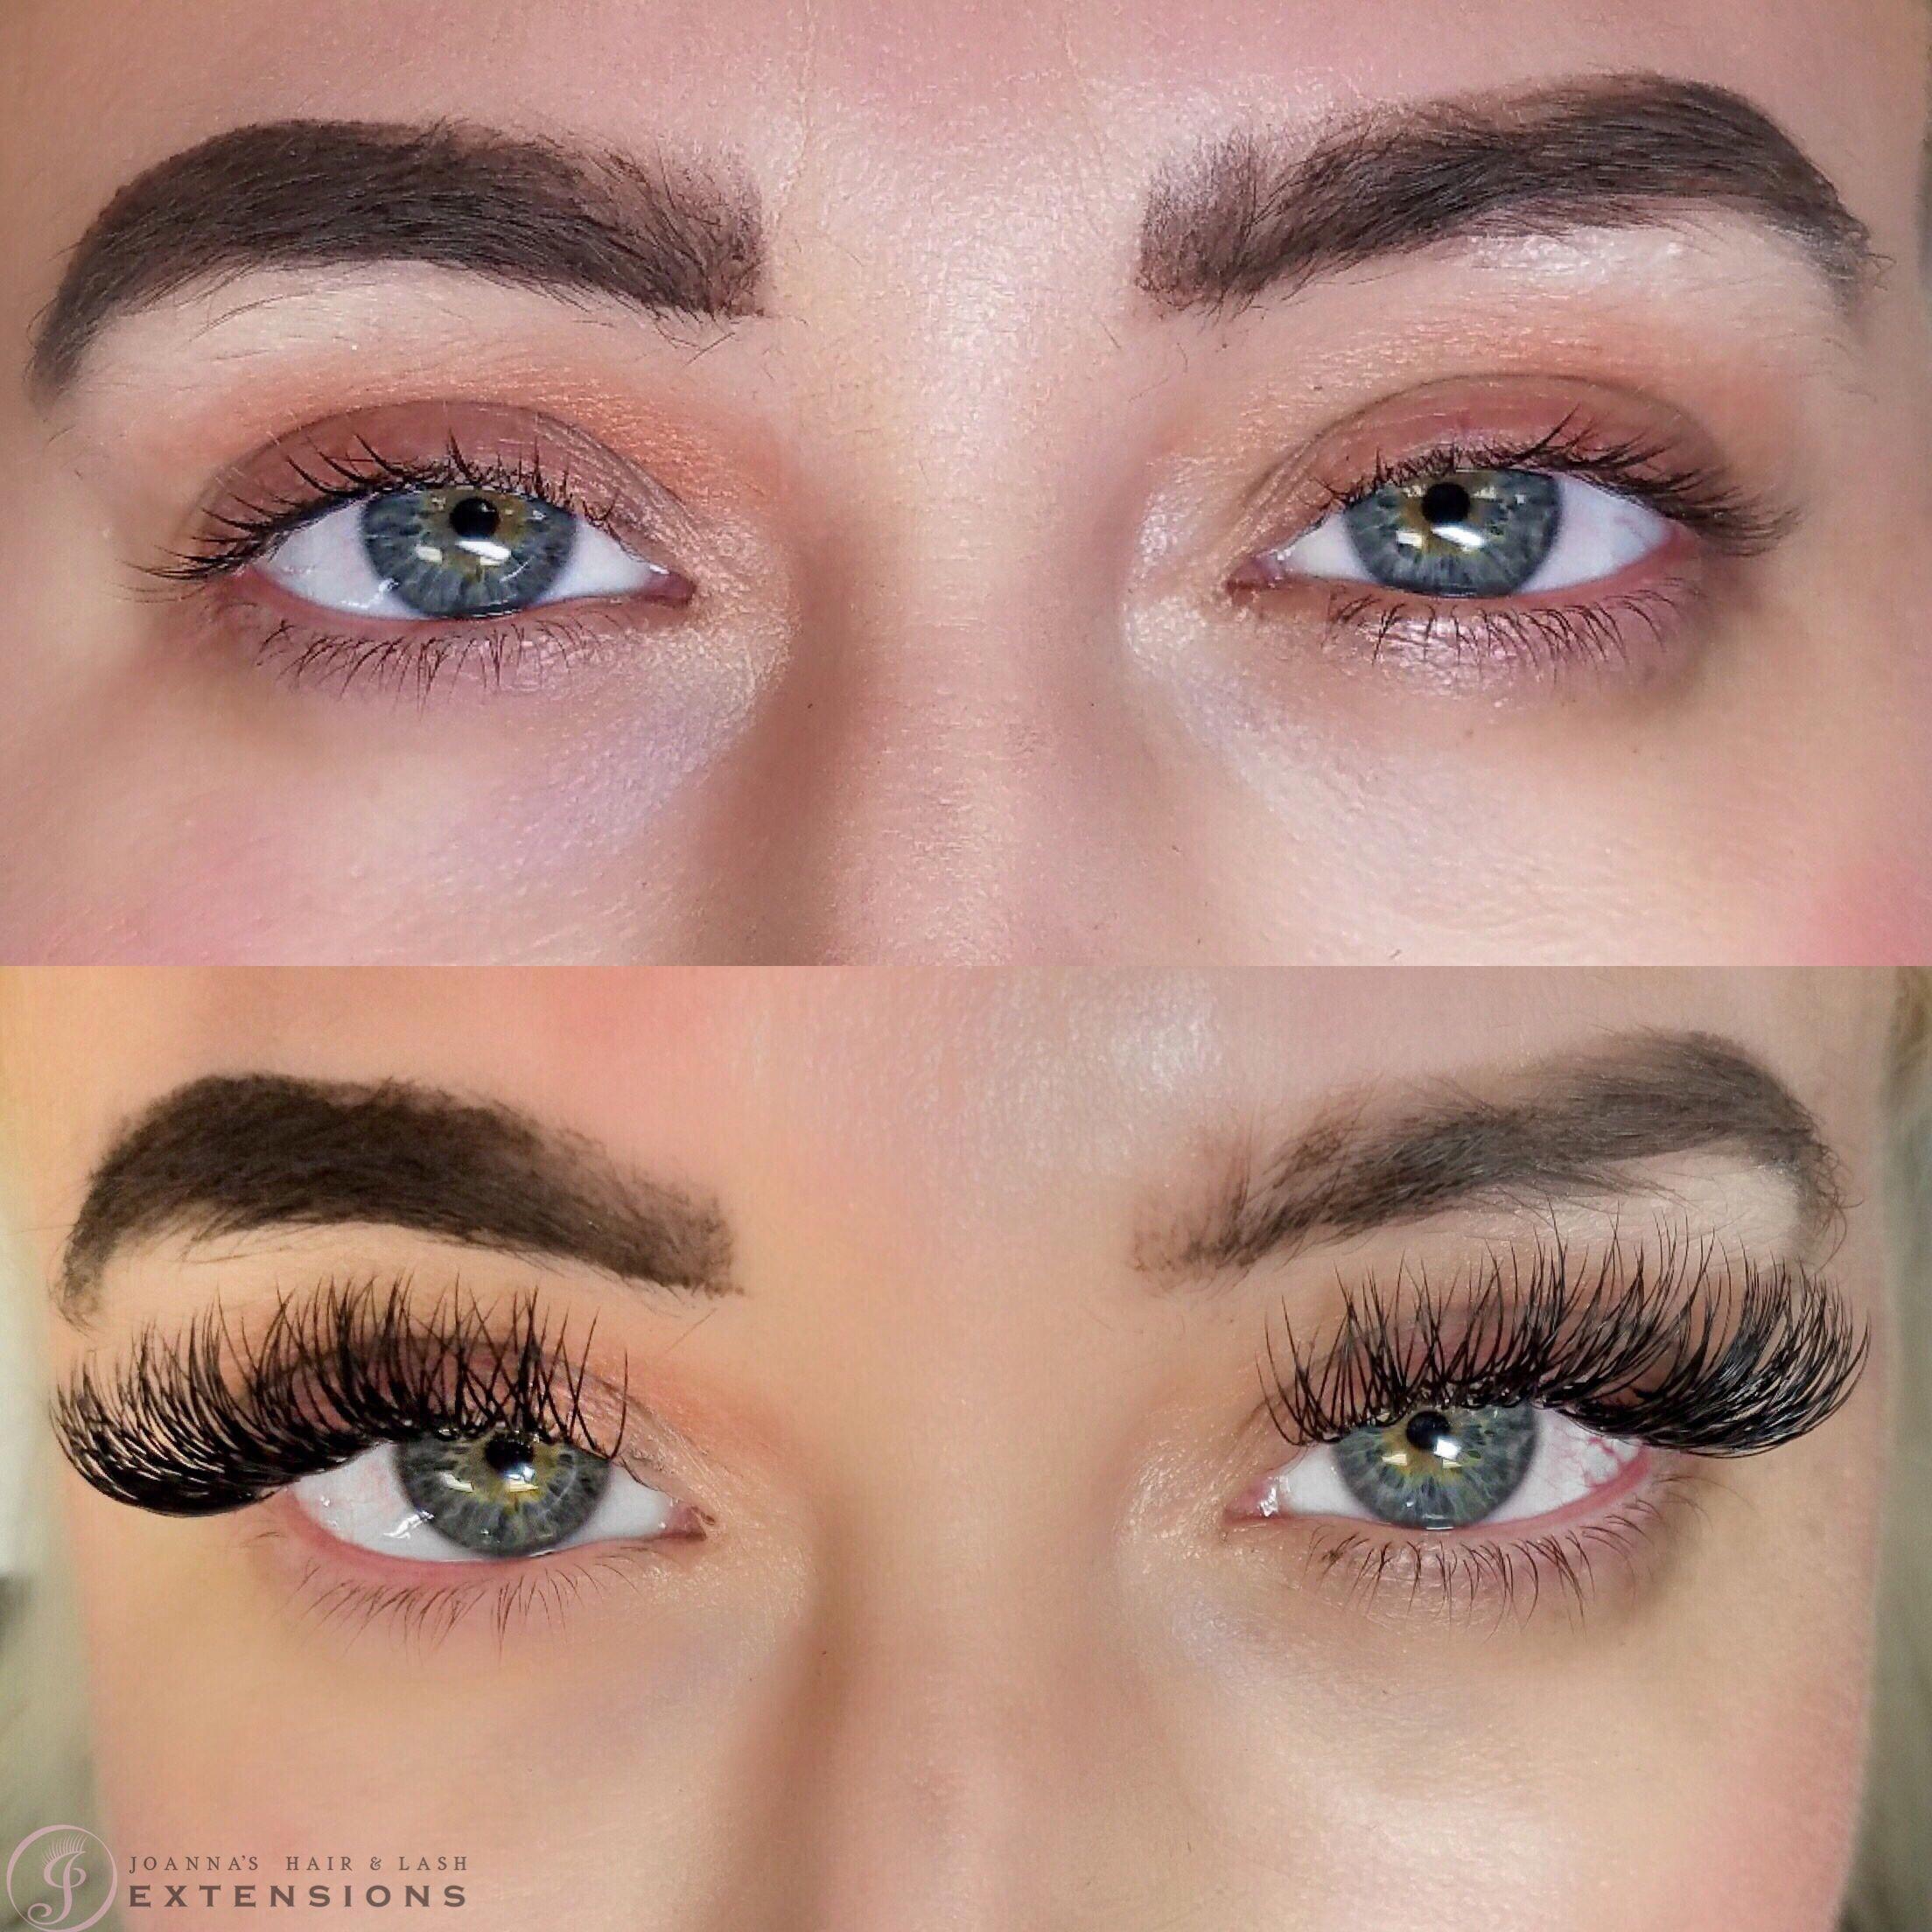 eyelashes tweezer Lashes Eyelashes, Eyelash extensions